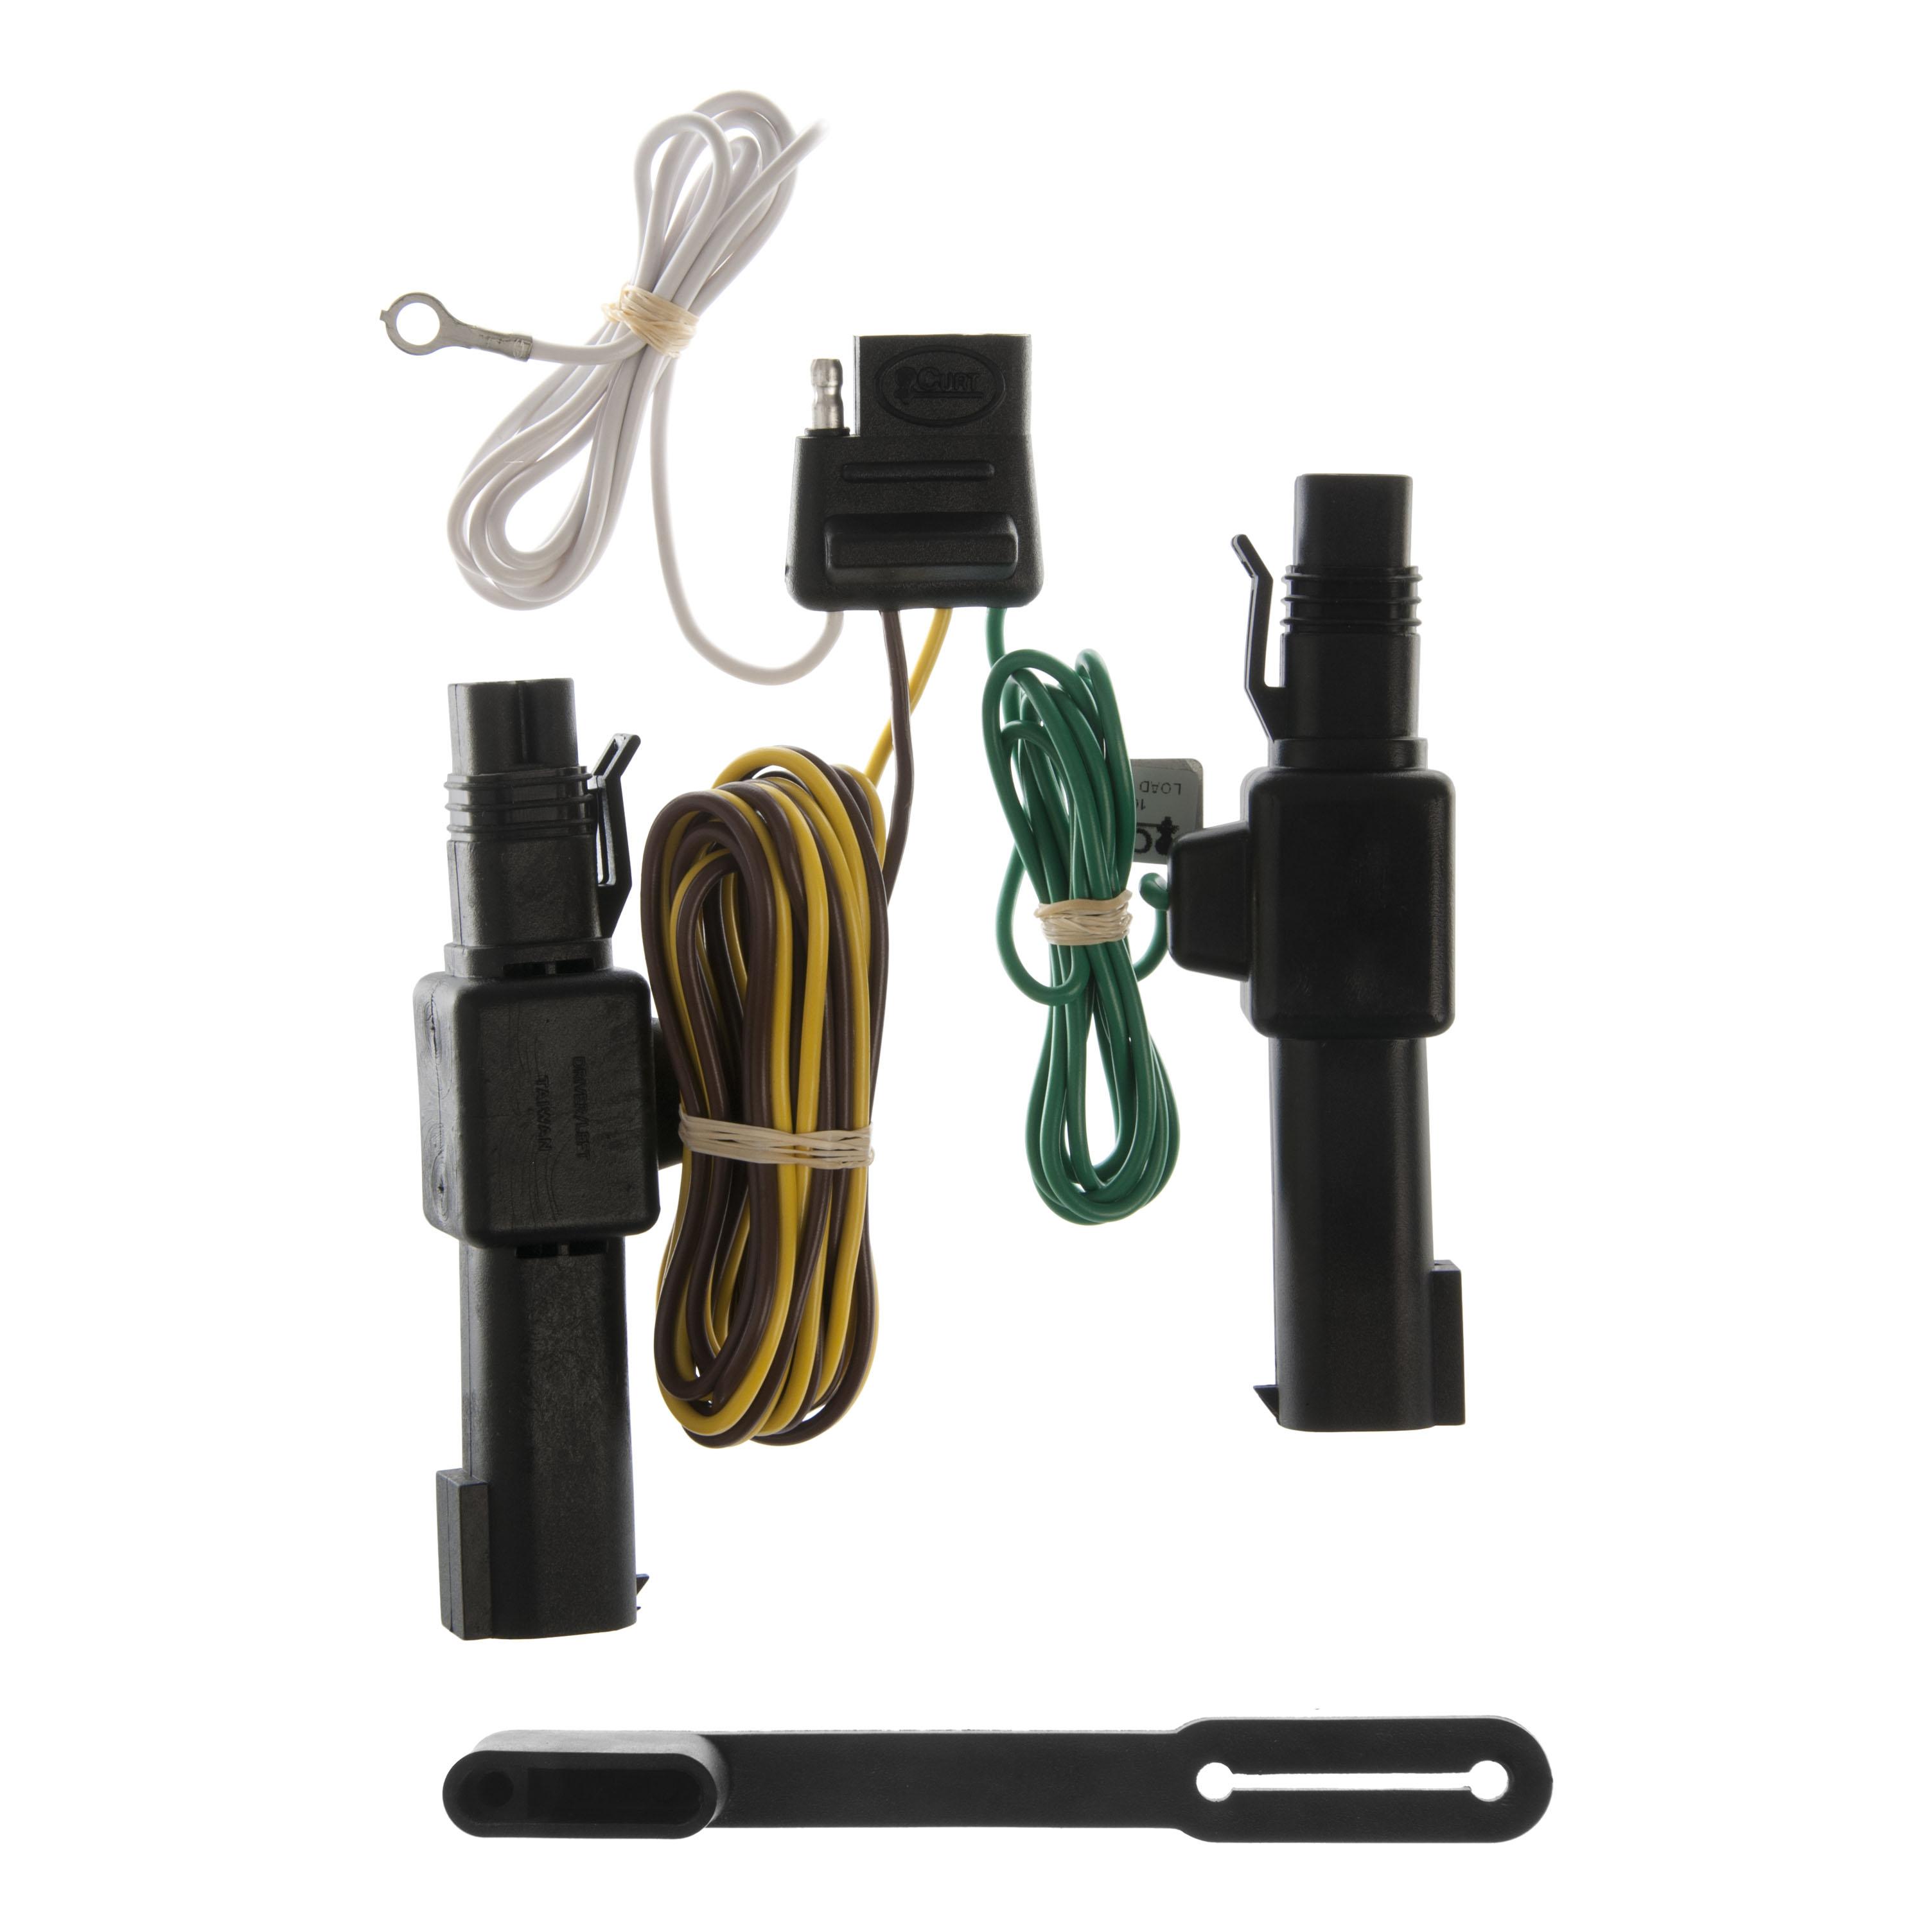 CURT 55317 Custom Wiring Harness for Dodge Dakota, Ram